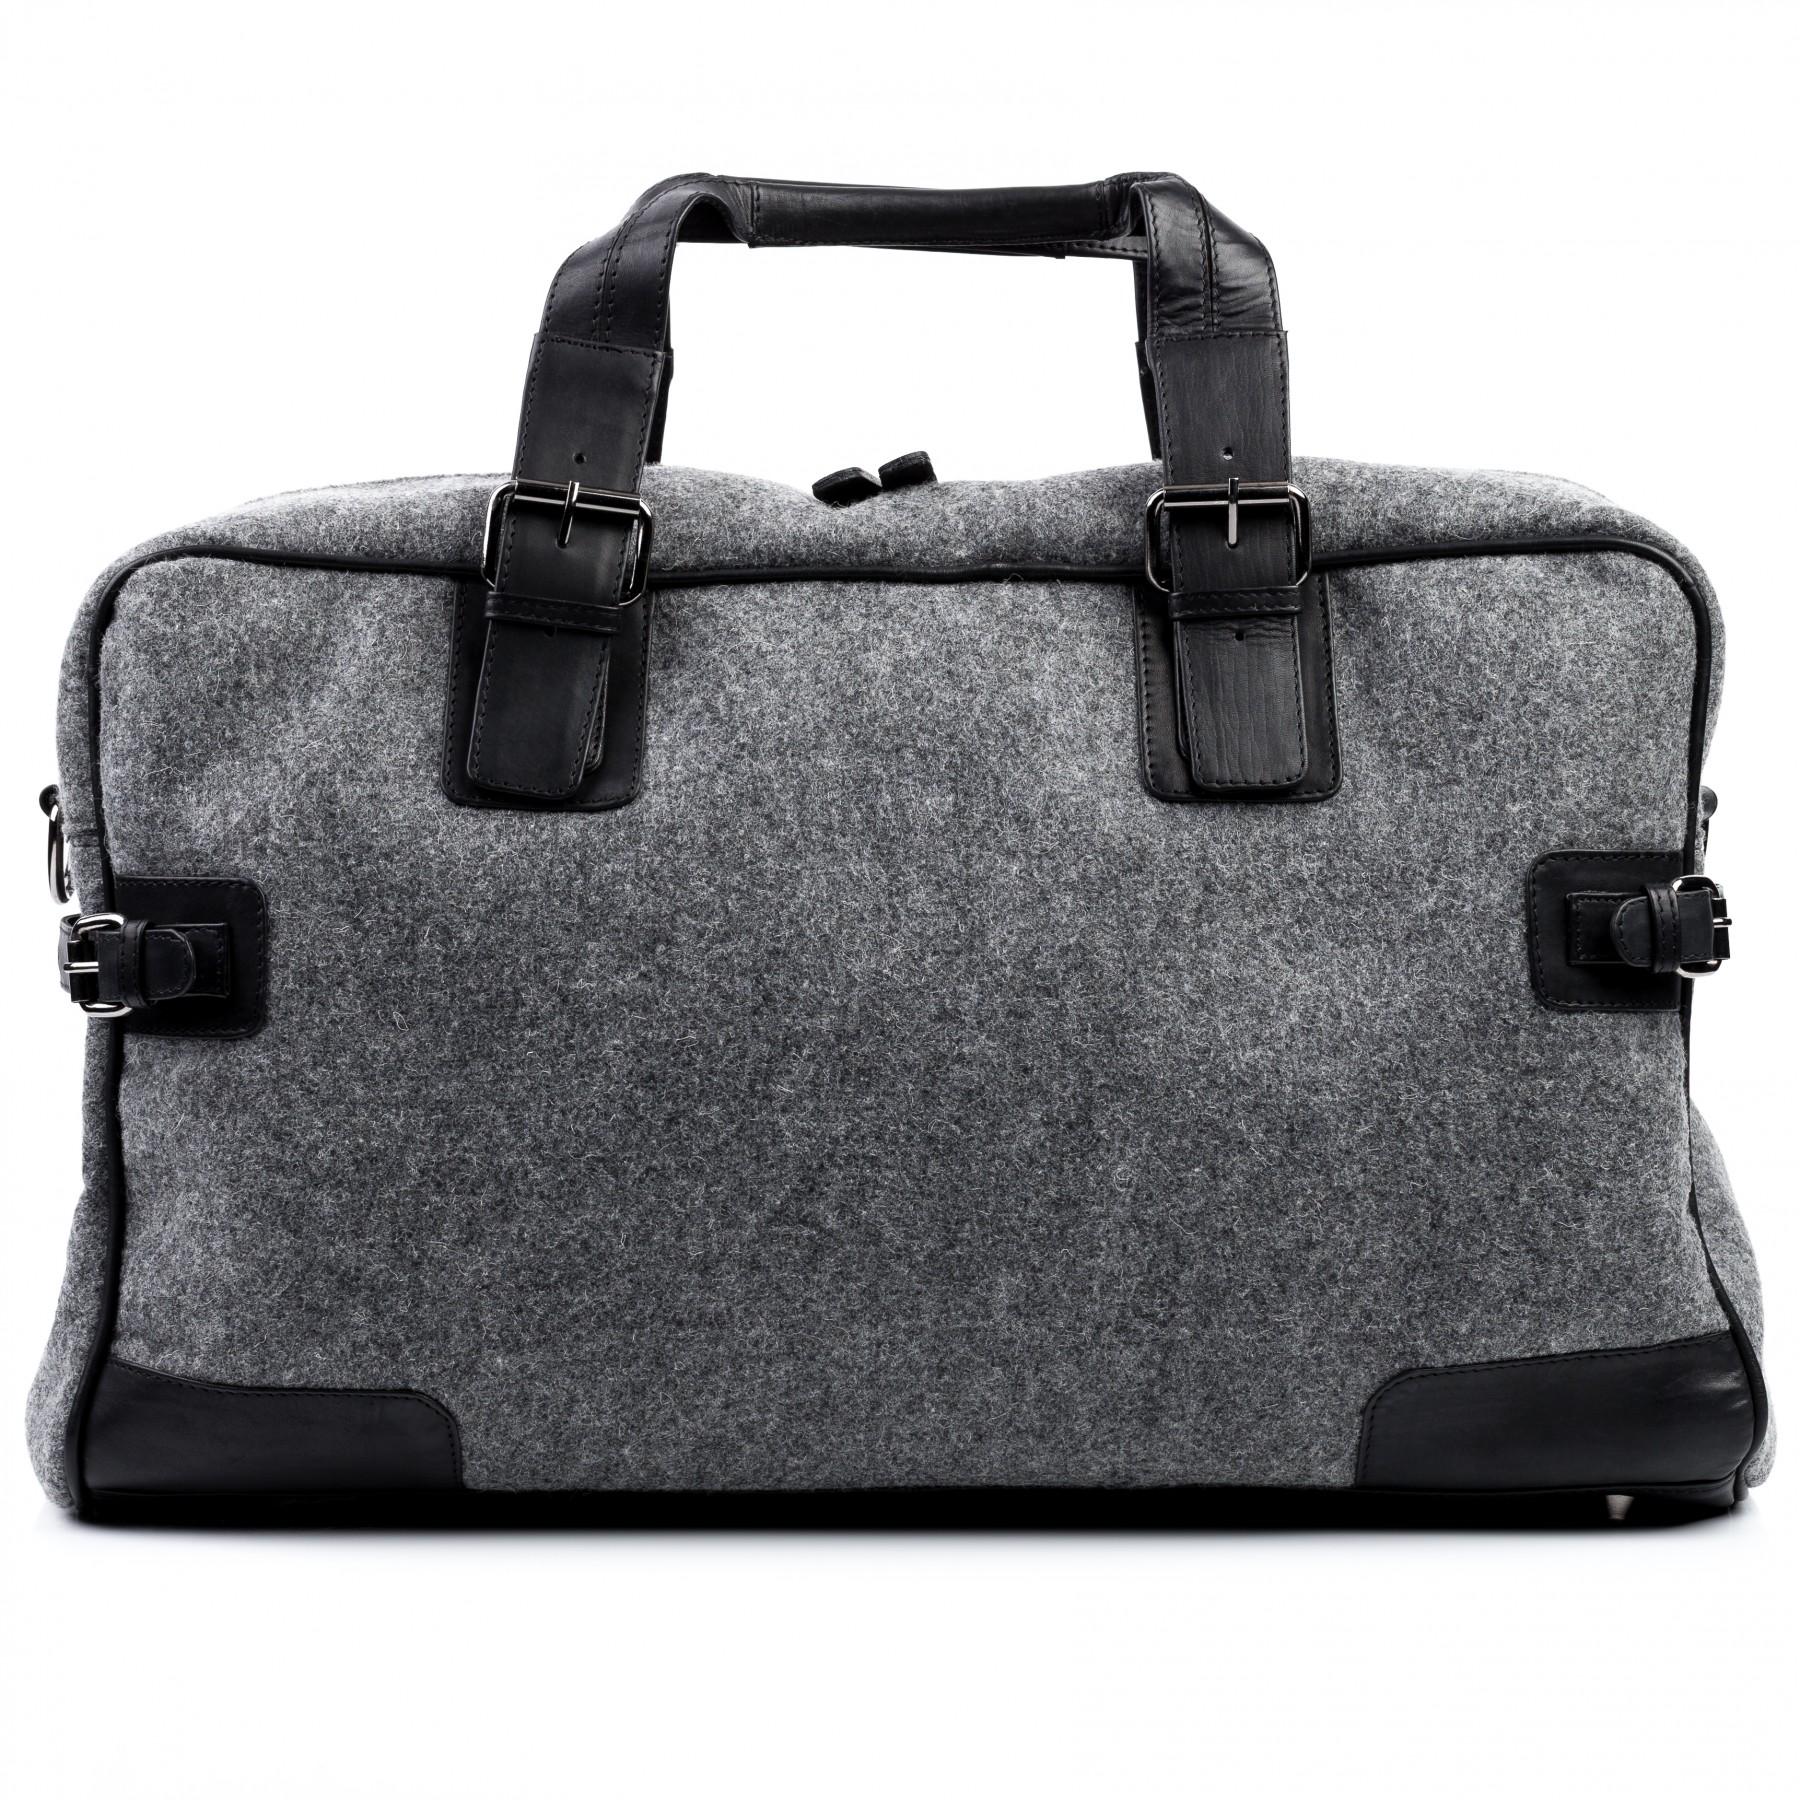 439f48889f0b FEYNSINN travel bag holdall Felt   Leather SARAH black-grey ...